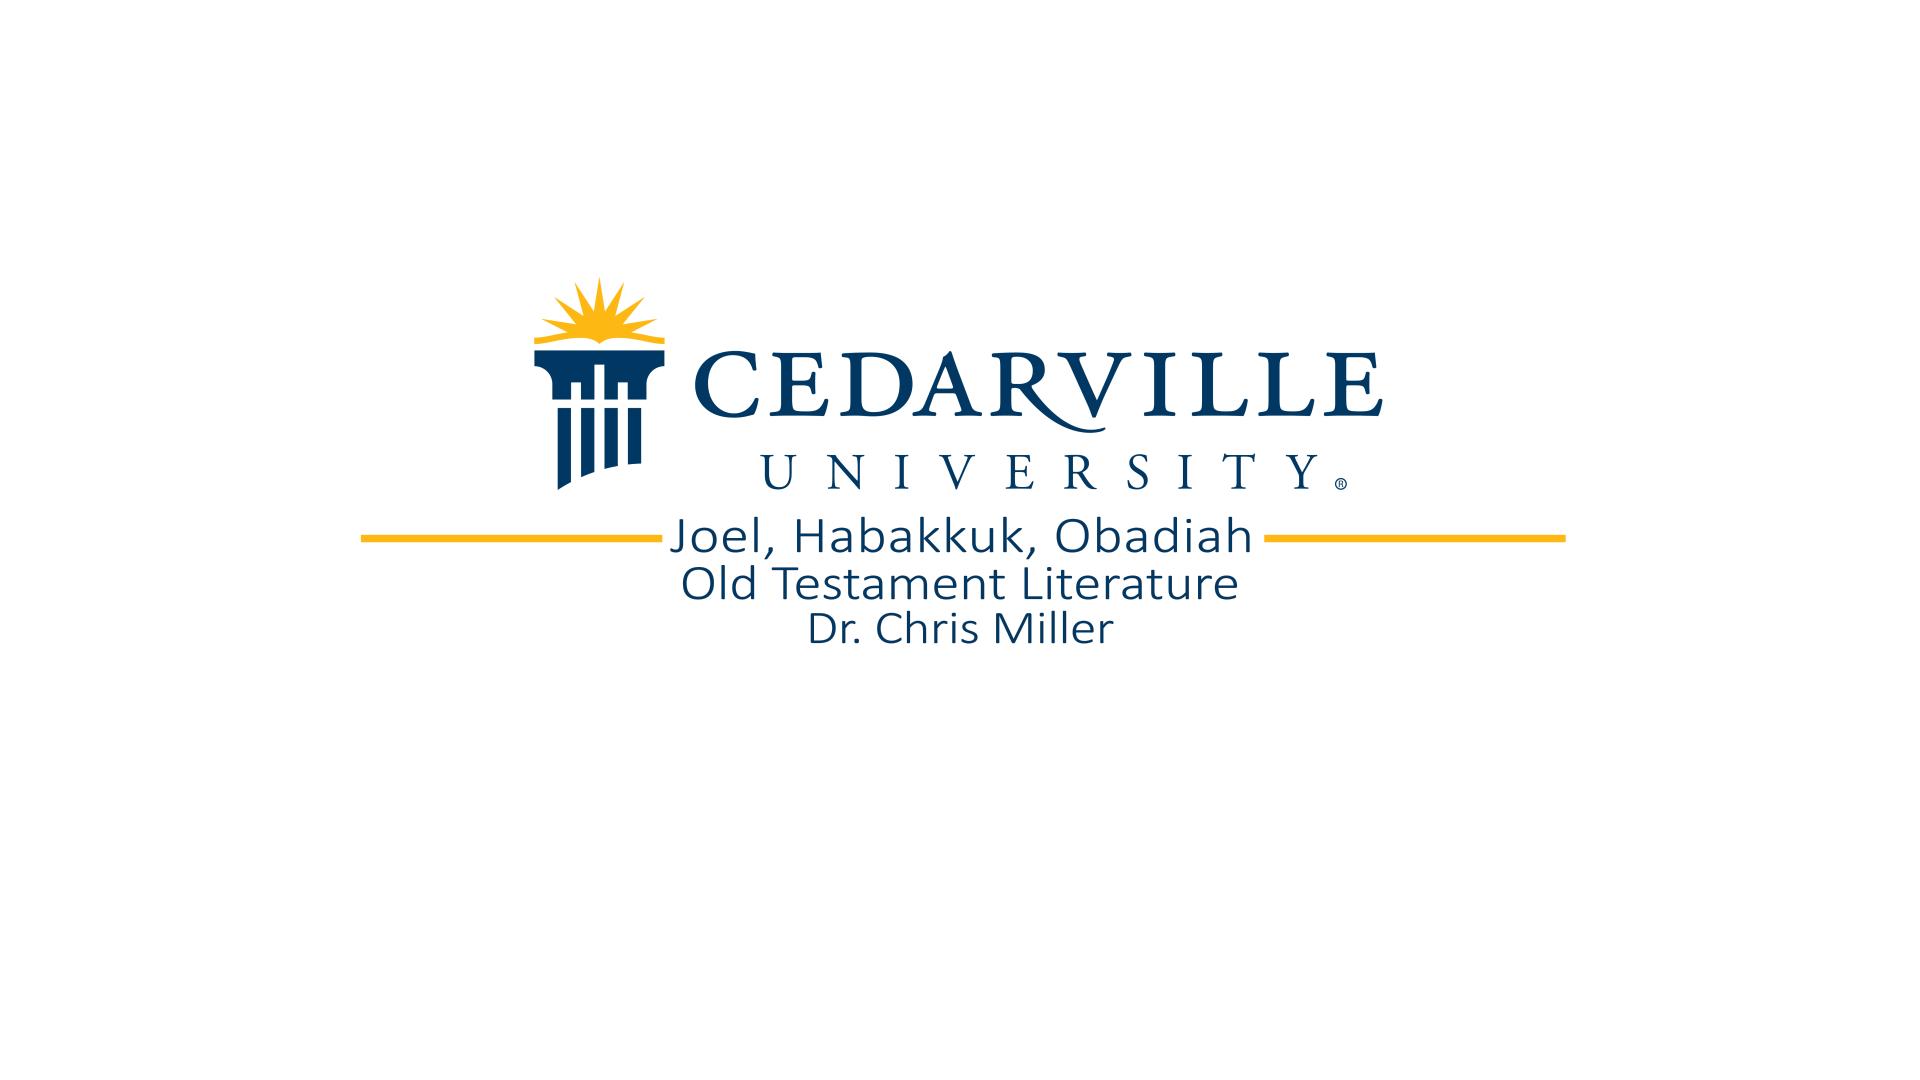 View thumbnail for Joel, Habakkuk, and Obadiah